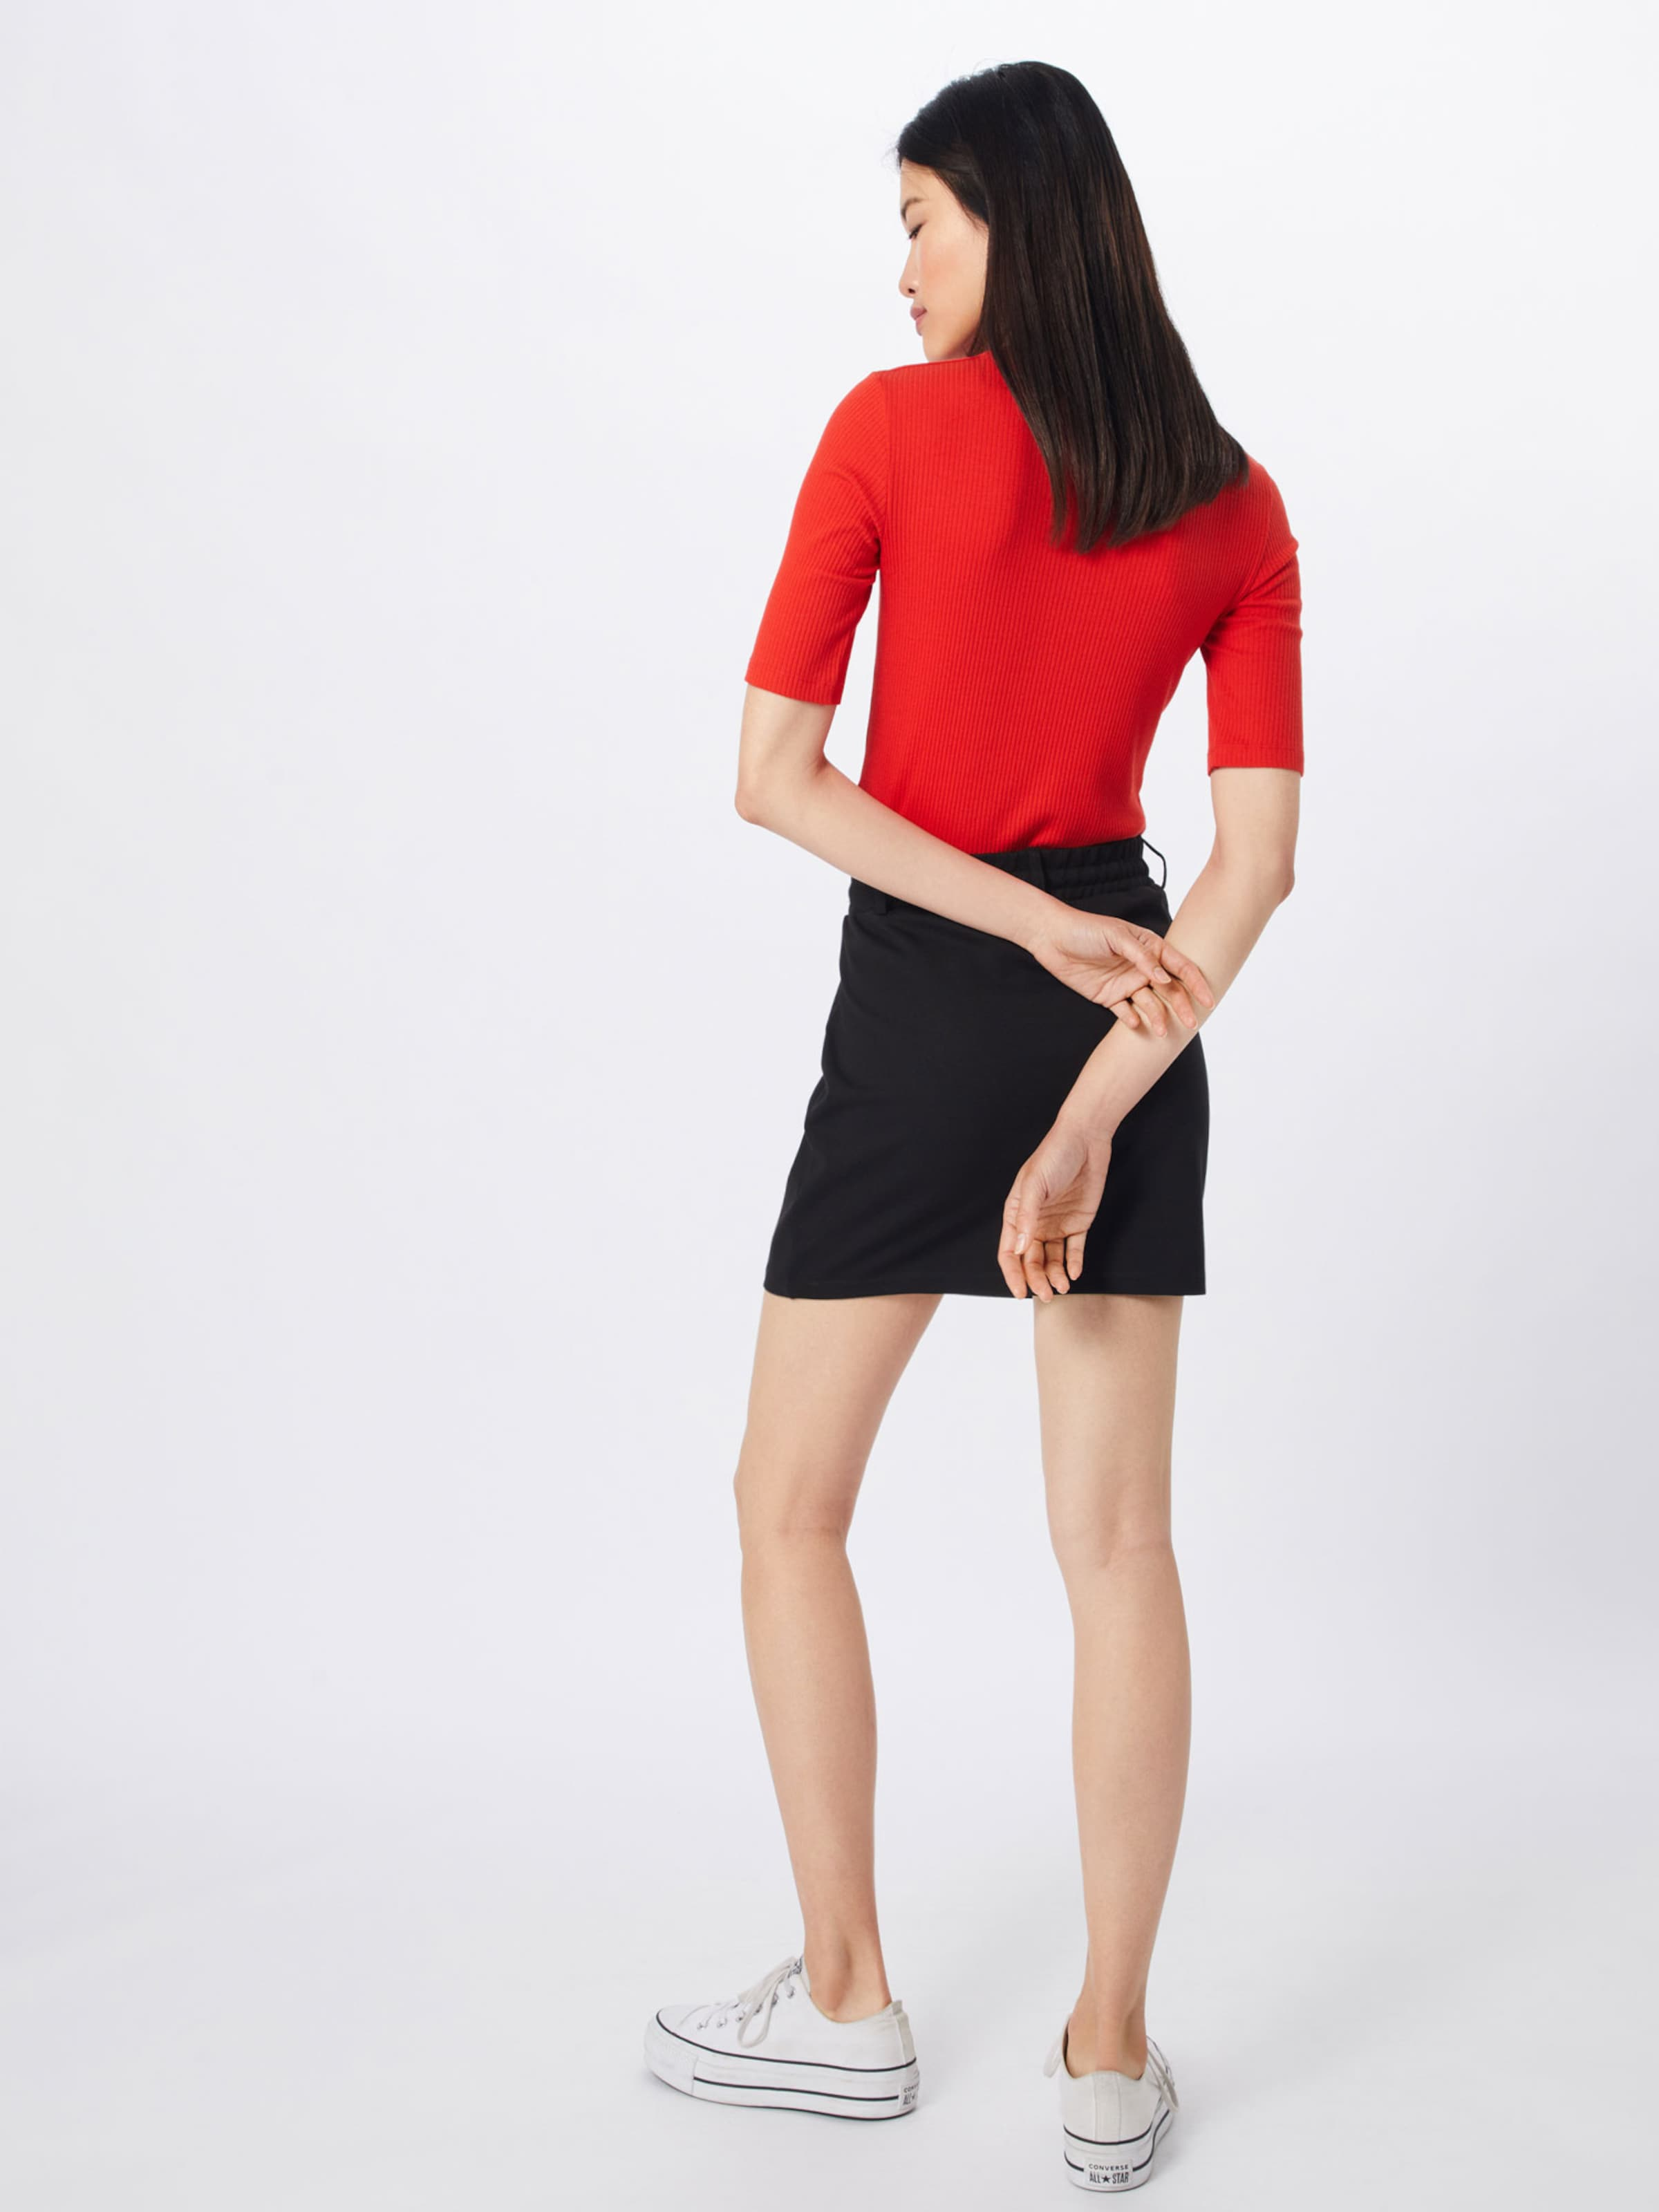 New Skirt' En Noir Jacqueline 'jdypretty Yong De Jupe exoBrdCW